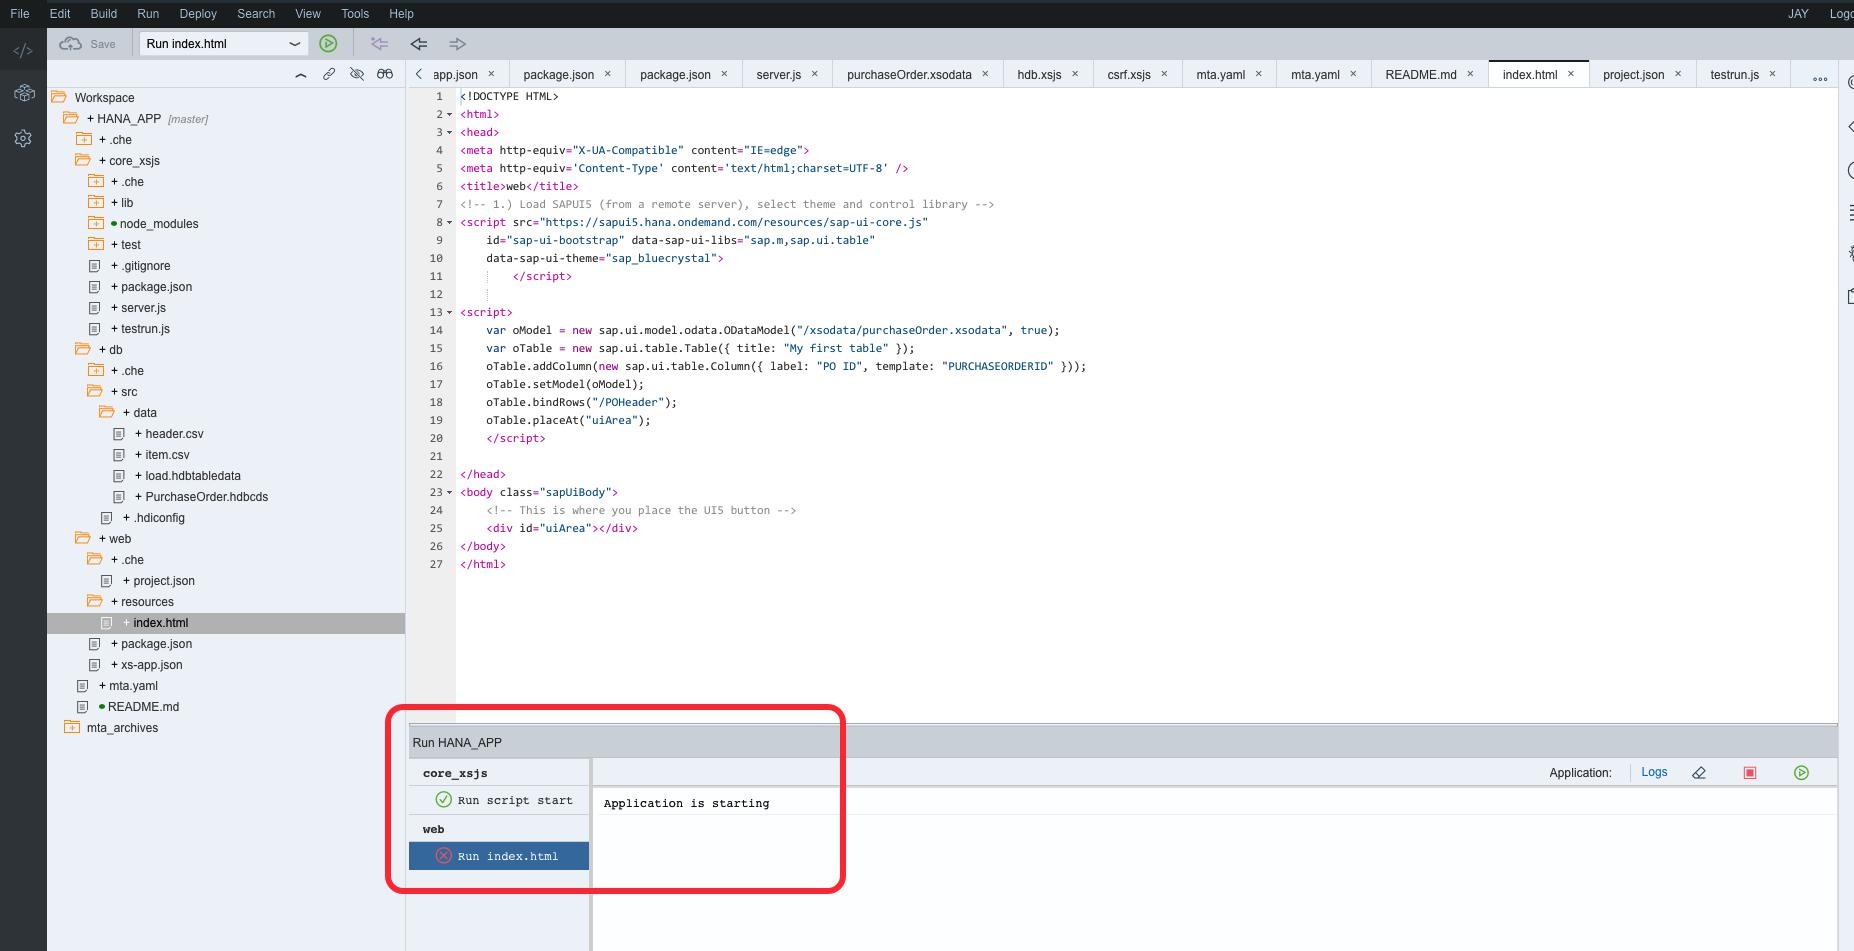 SAP HANA XS Advanced - Consume the OData service in a basic HTML5